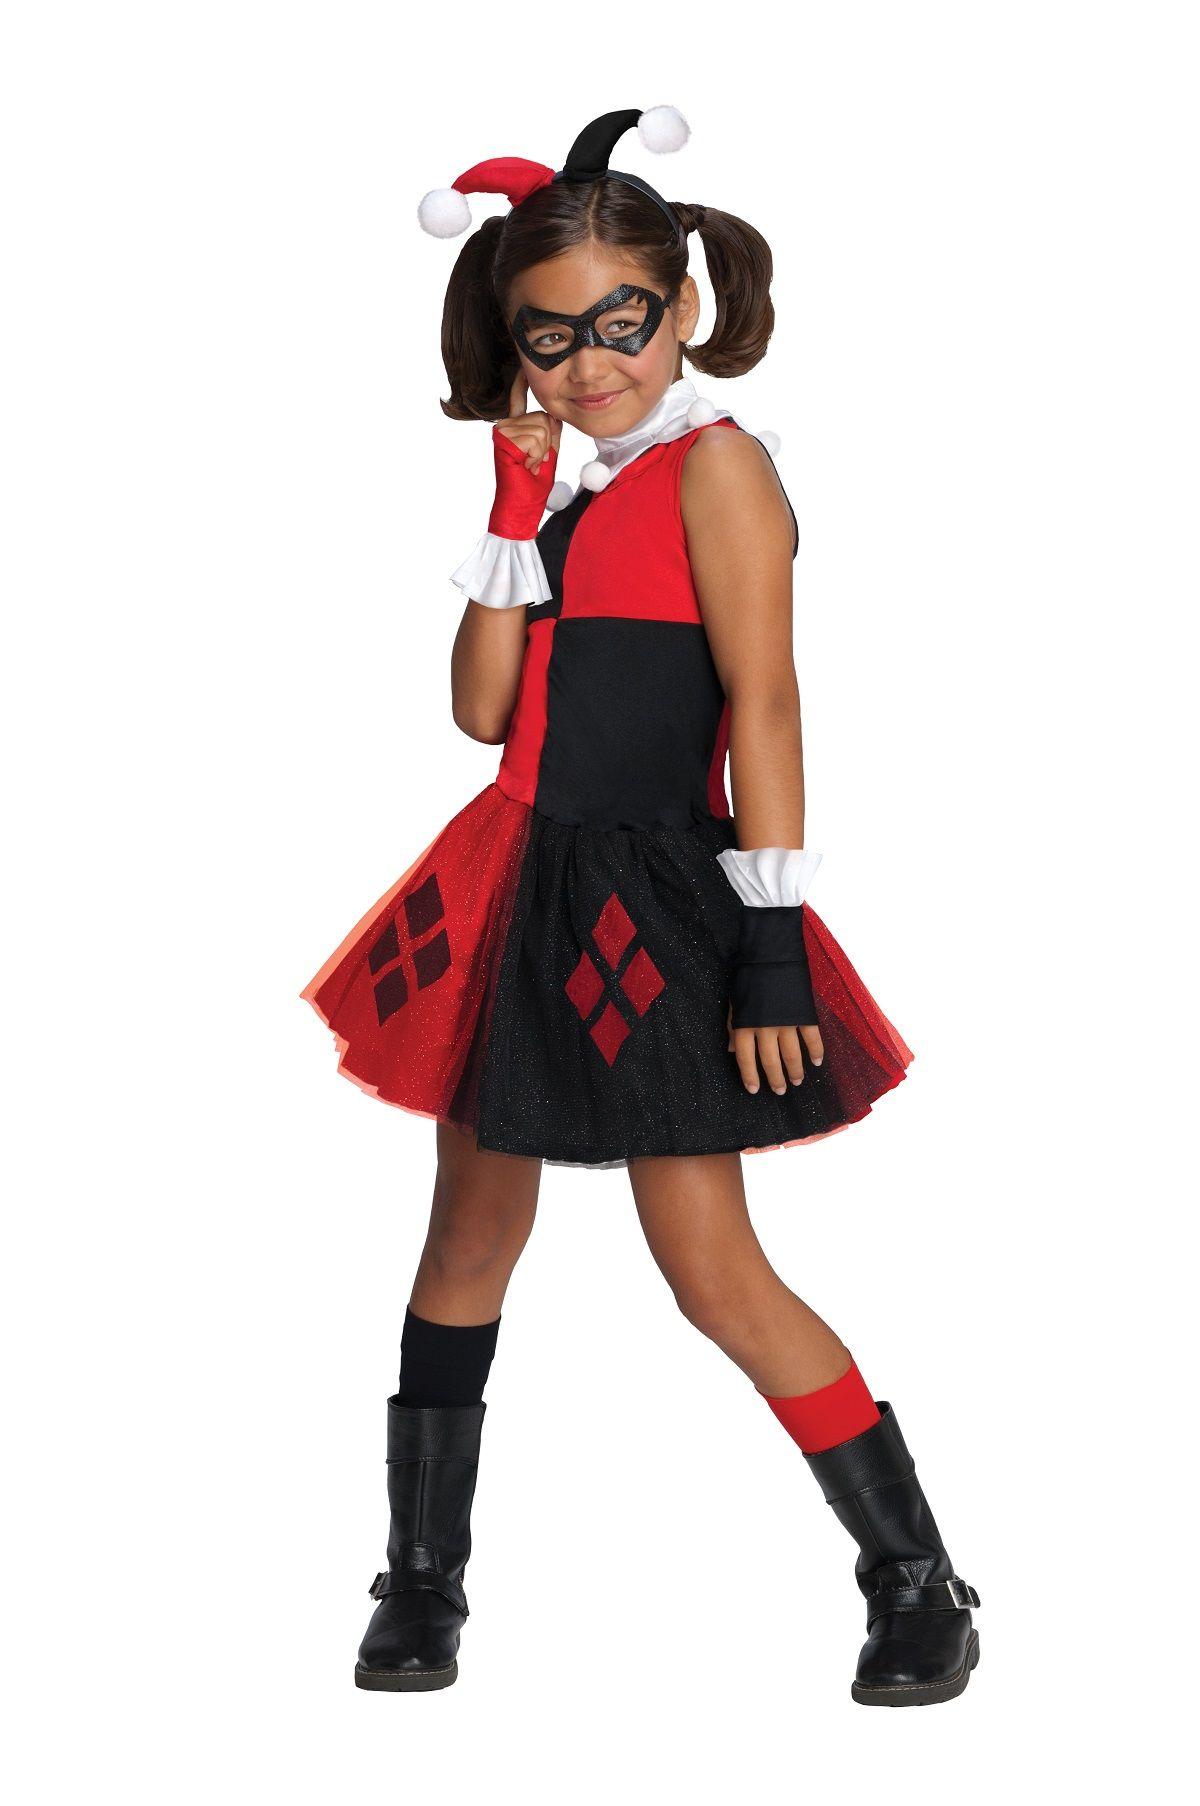 Kids Harley Quinn Super Villian Girls Costume Heroesvsvillians Halloween